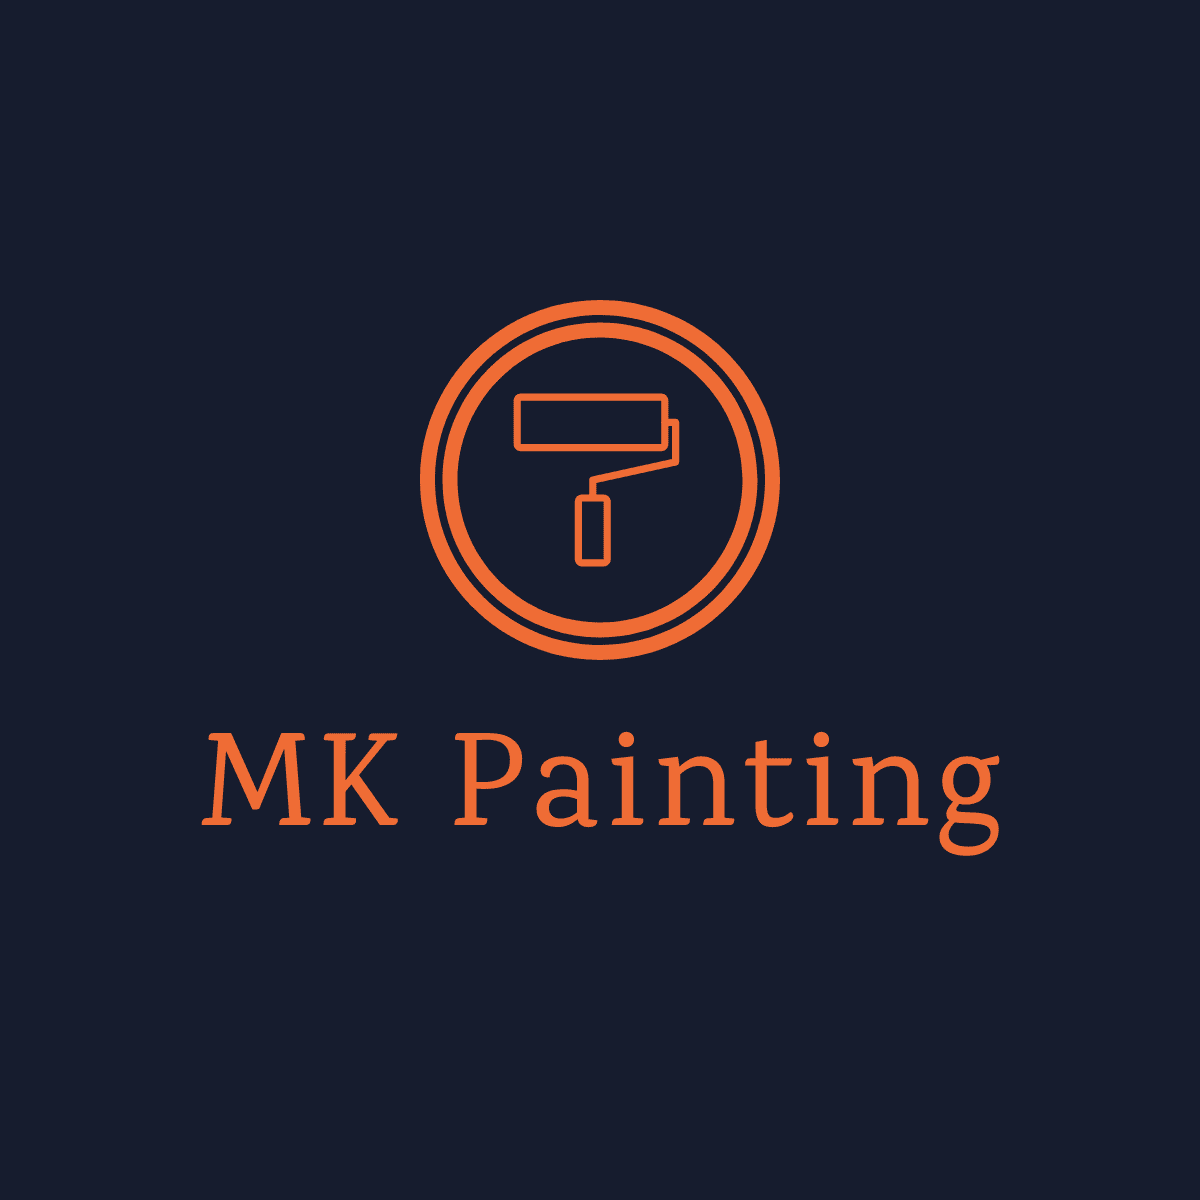 MK Painting